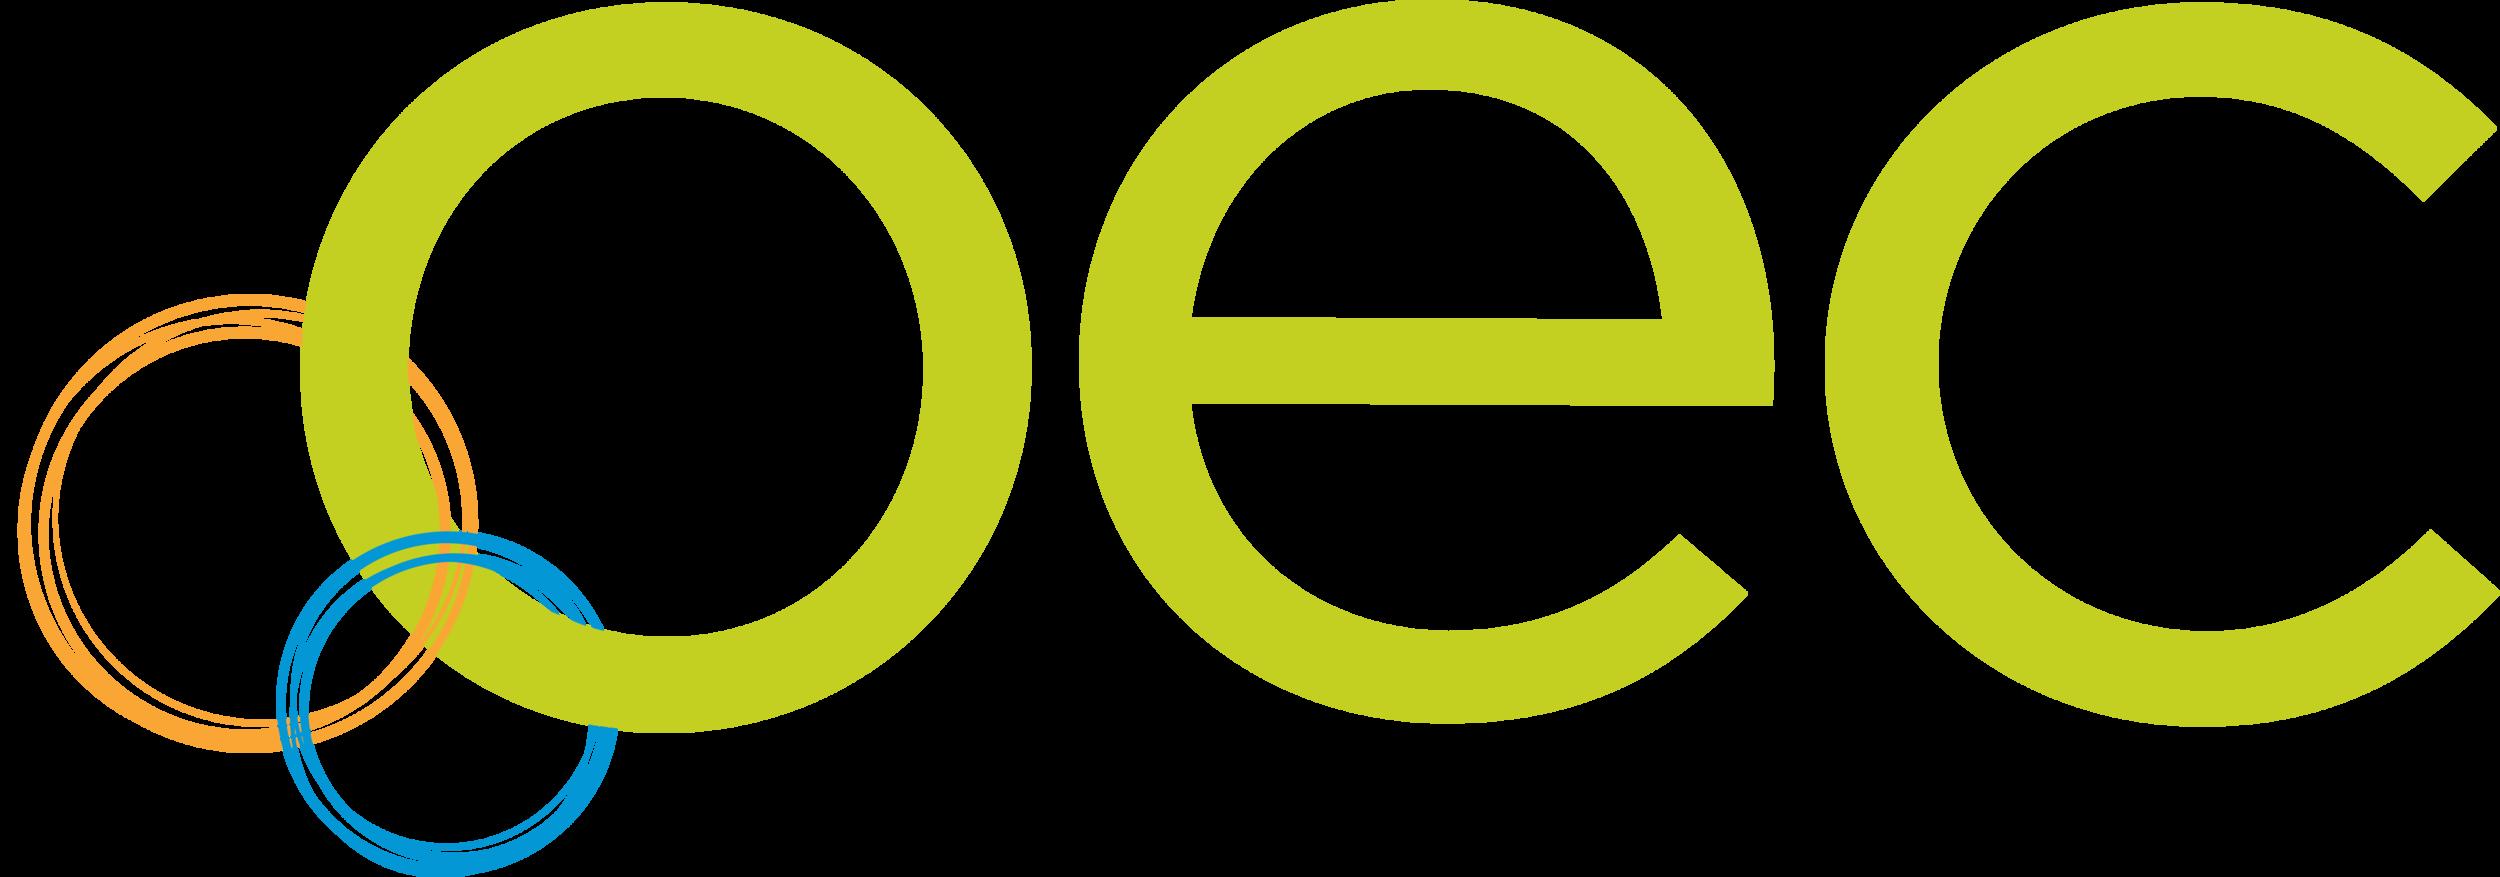 oec_logo.png